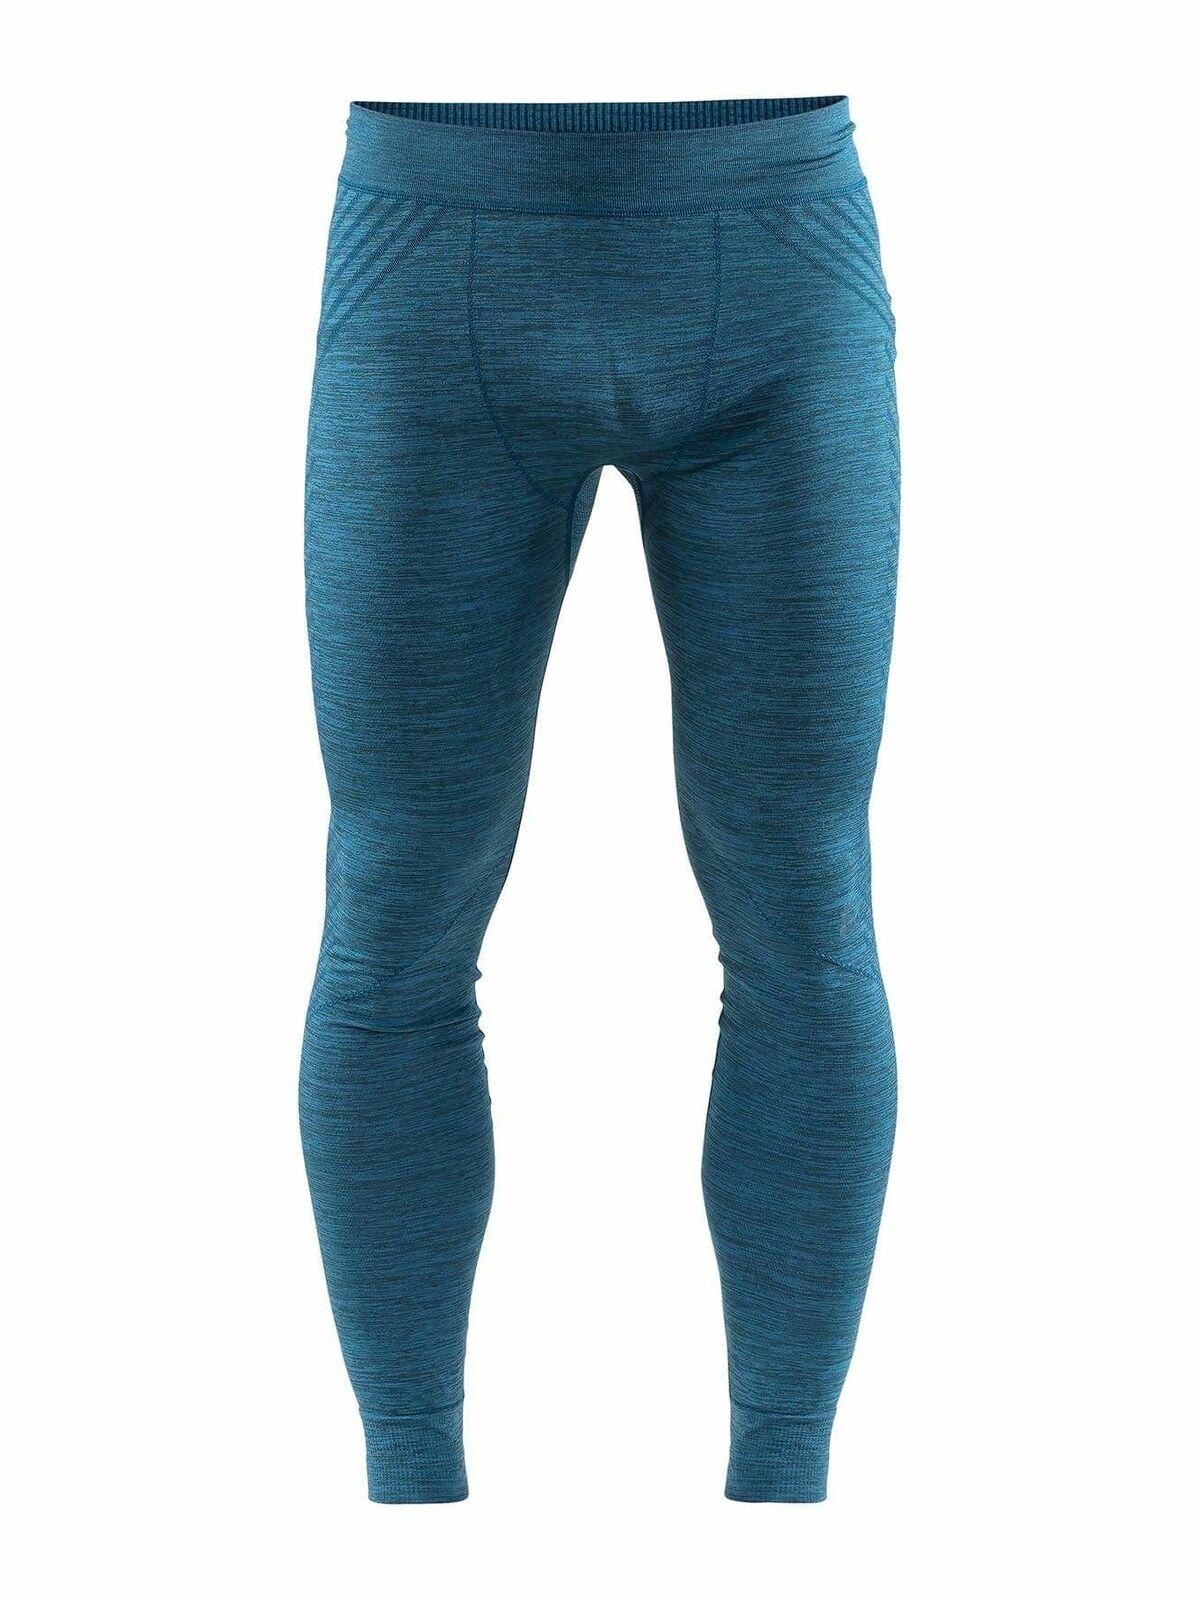 Craft Fuseknit Comfort Pantaloni M Uomo Sportivi Fitnesshose Funzionali